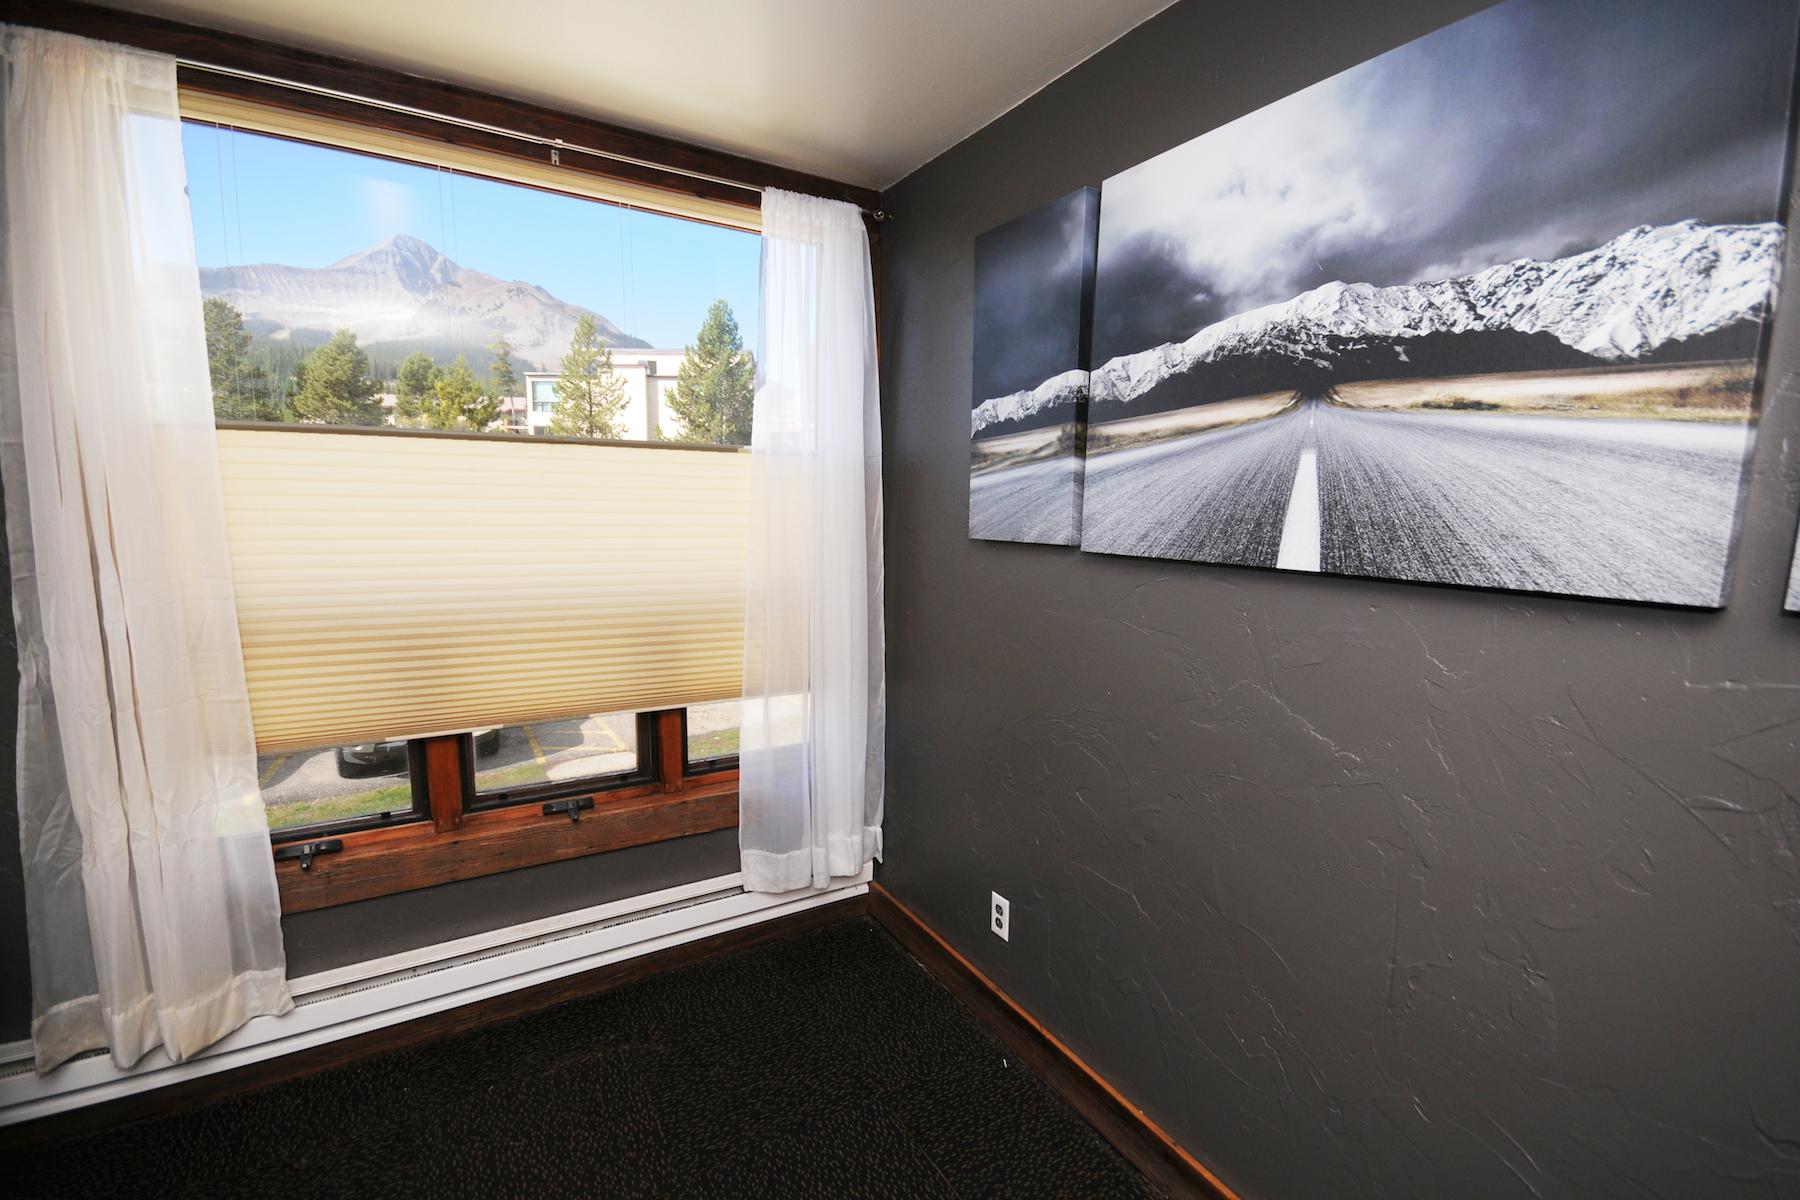 独户住宅 为 销售 在 Ski Condo Hill 1286 21 Sitting Bull Road Hill 1286 Big Sky, 蒙大拿州 59716 美国